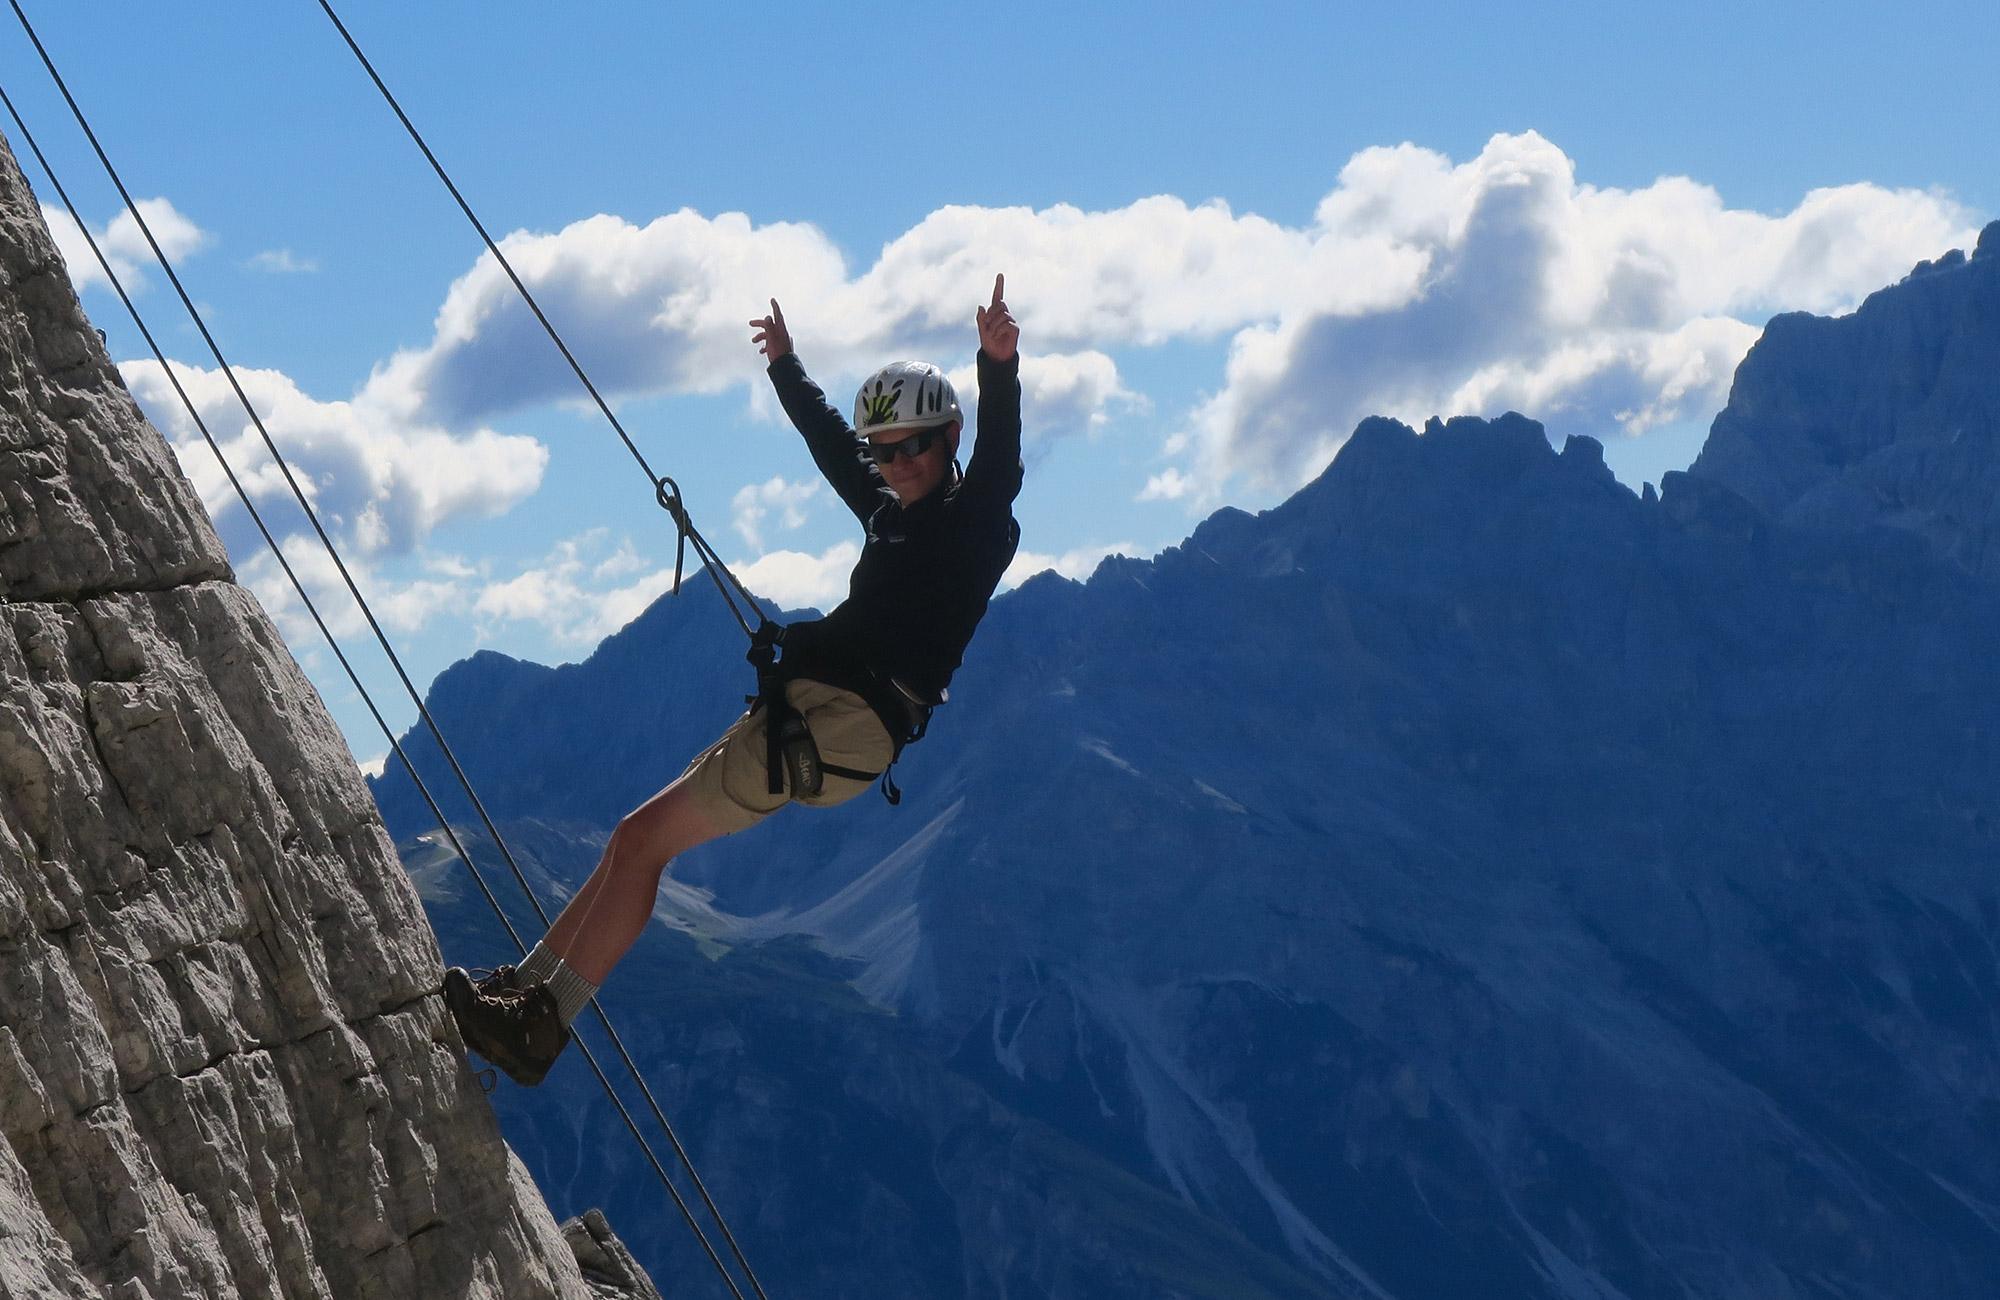 climbing in italy on teen summer trip